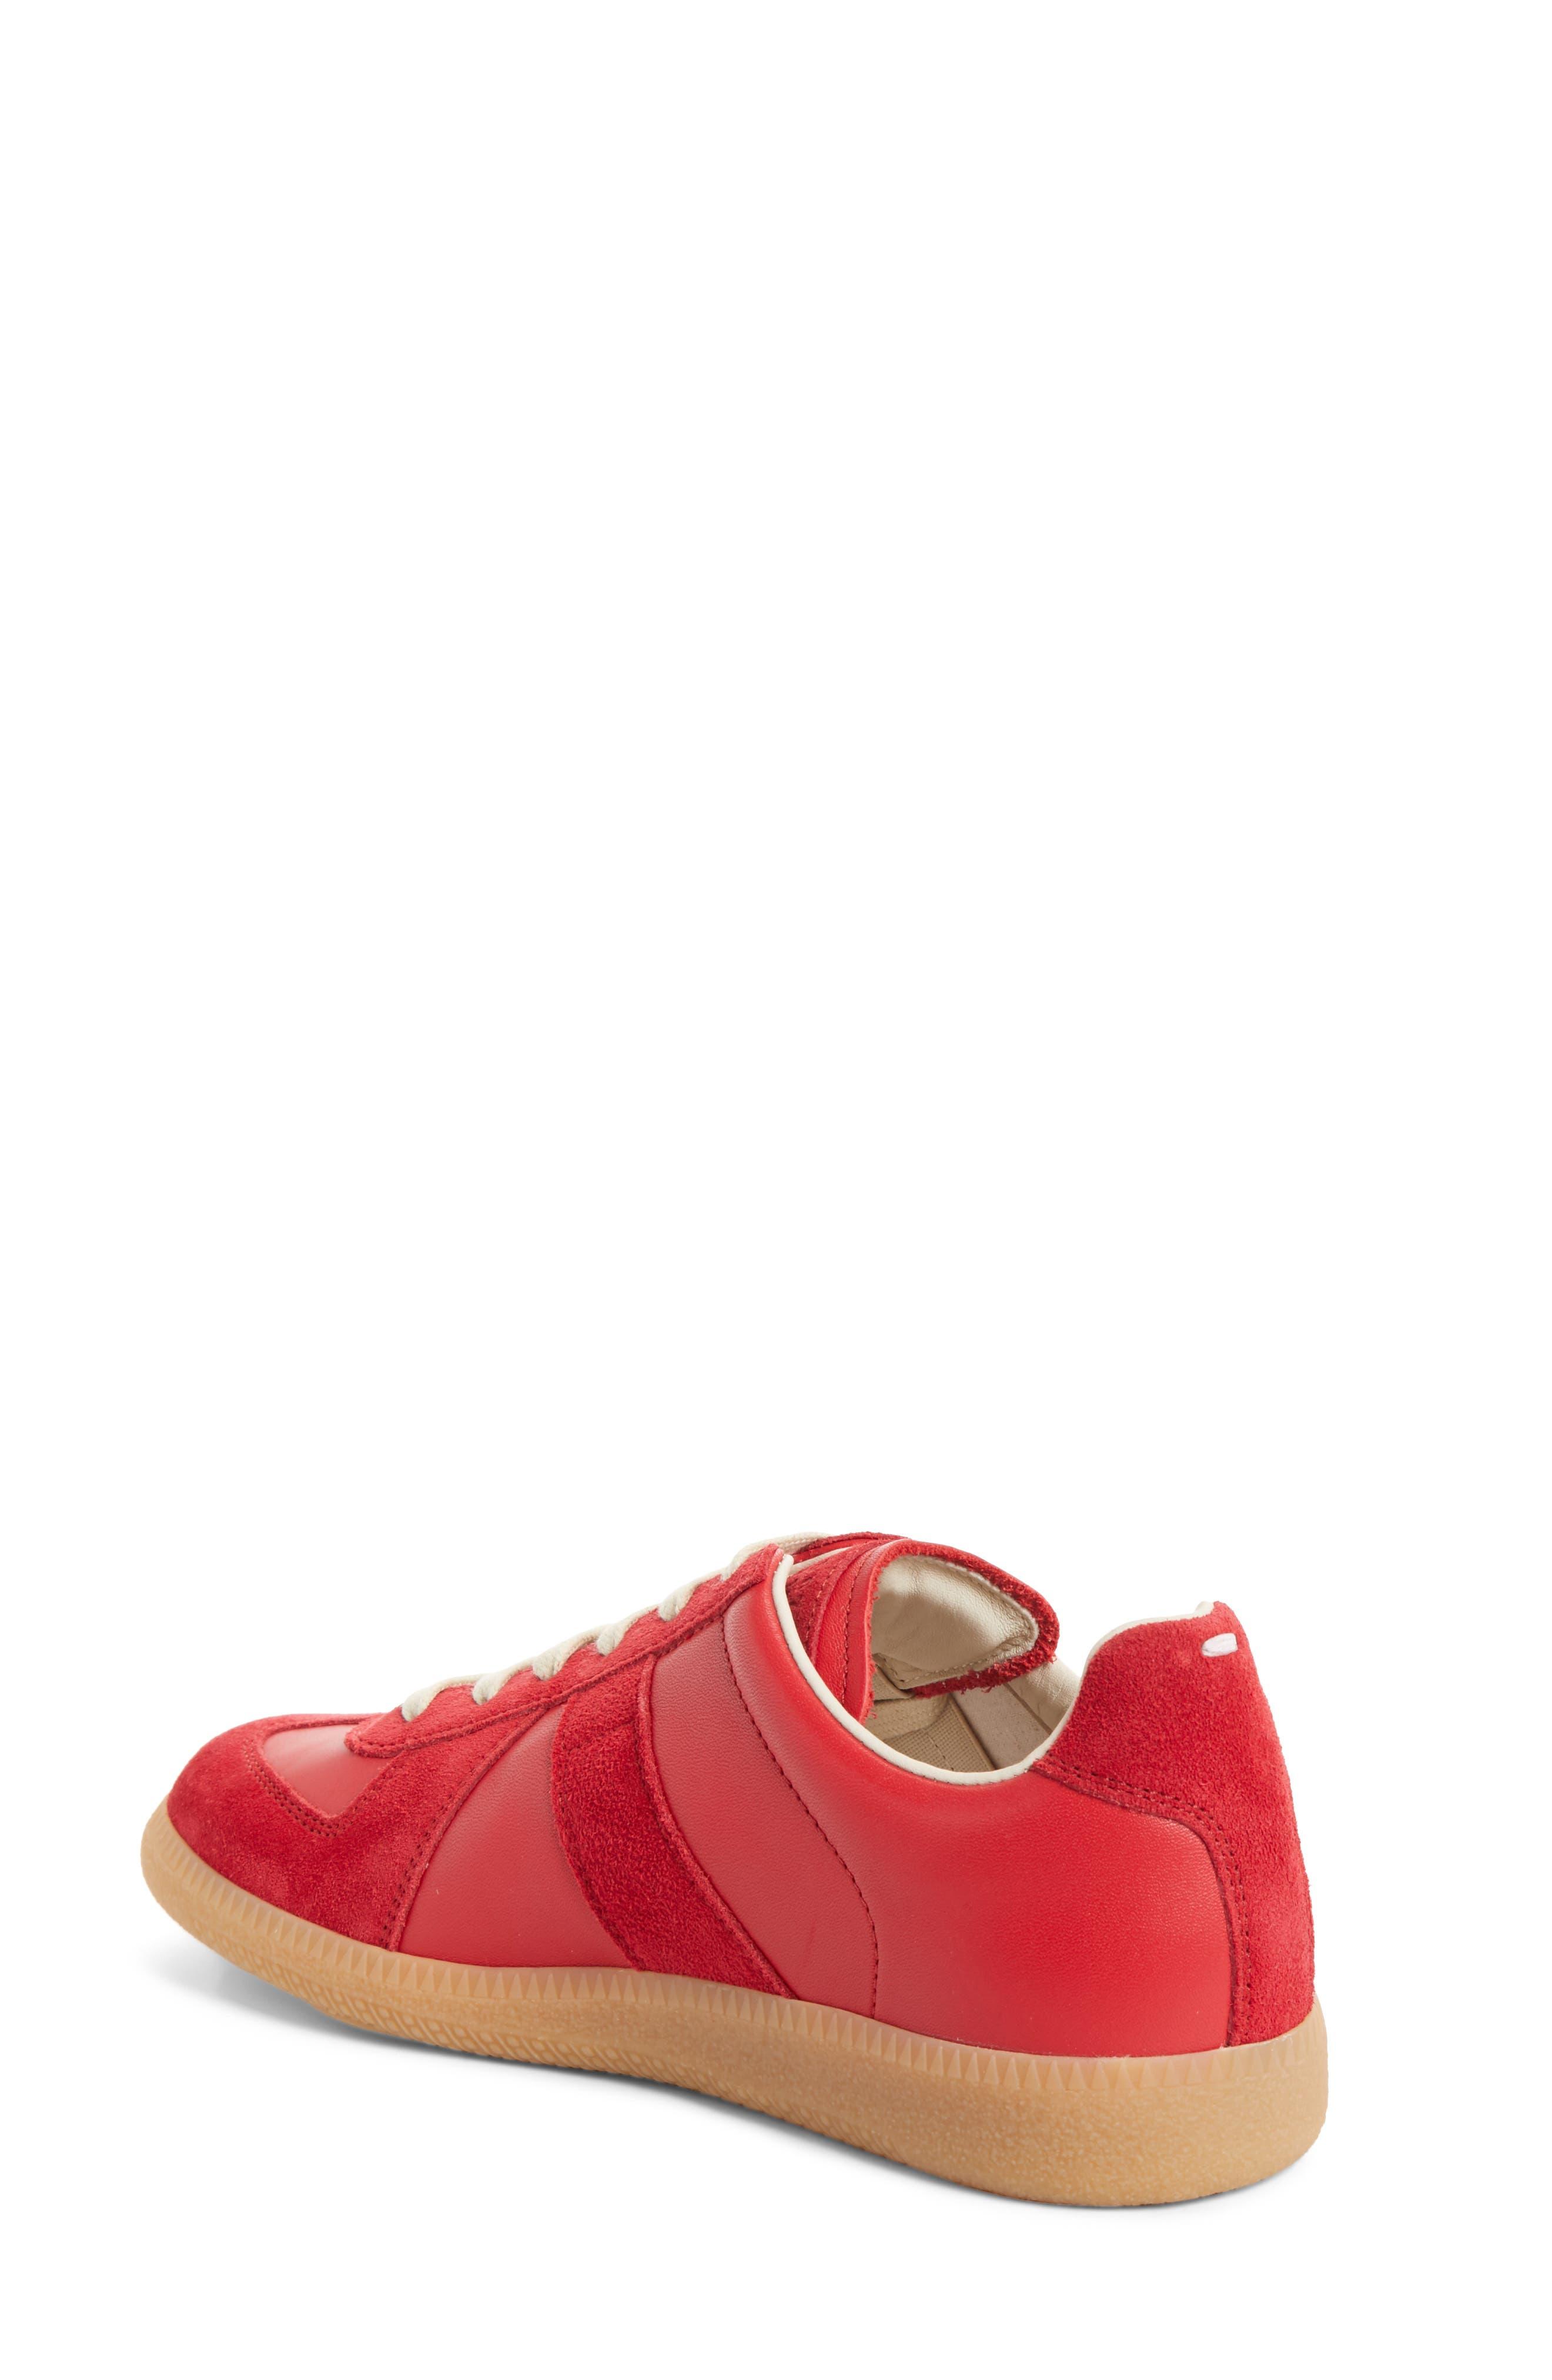 Replica Sneaker,                             Alternate thumbnail 2, color,                             Red/Amber